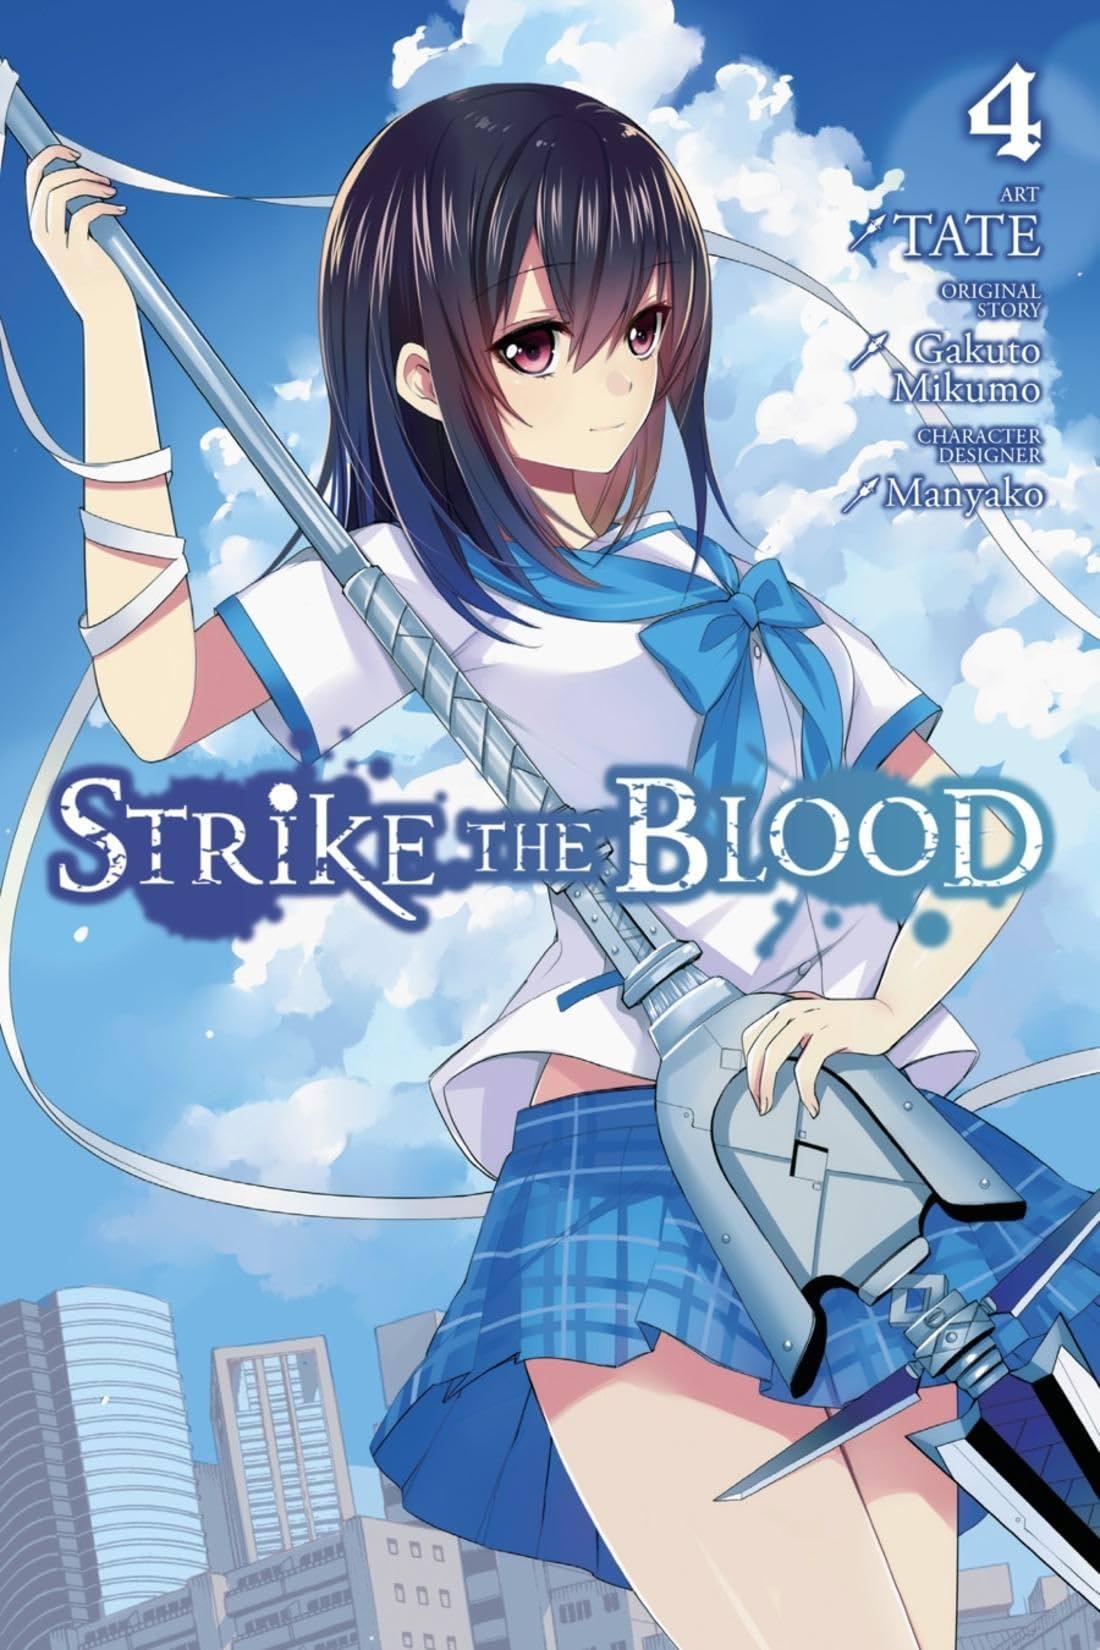 Strike the Blood Vol. 4